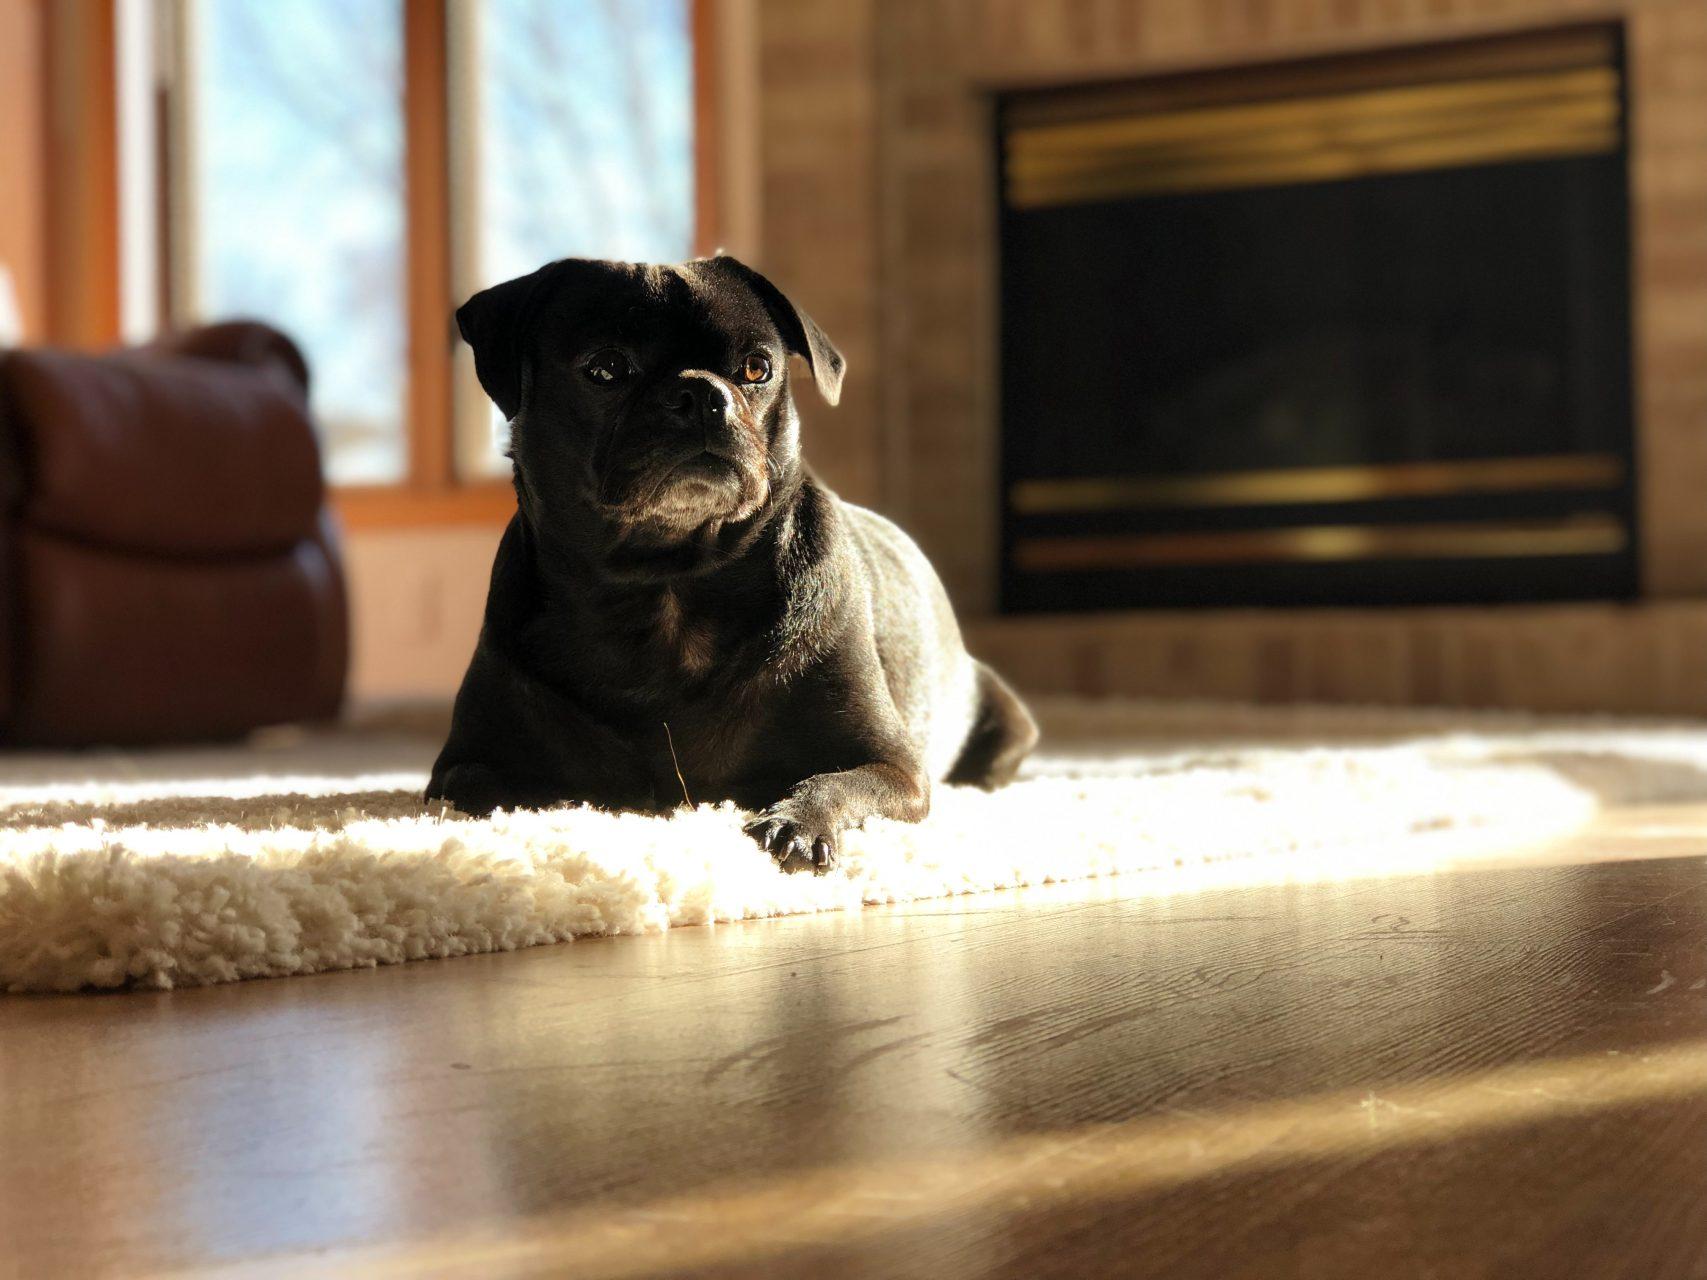 animal-black-dog-breed-2303476